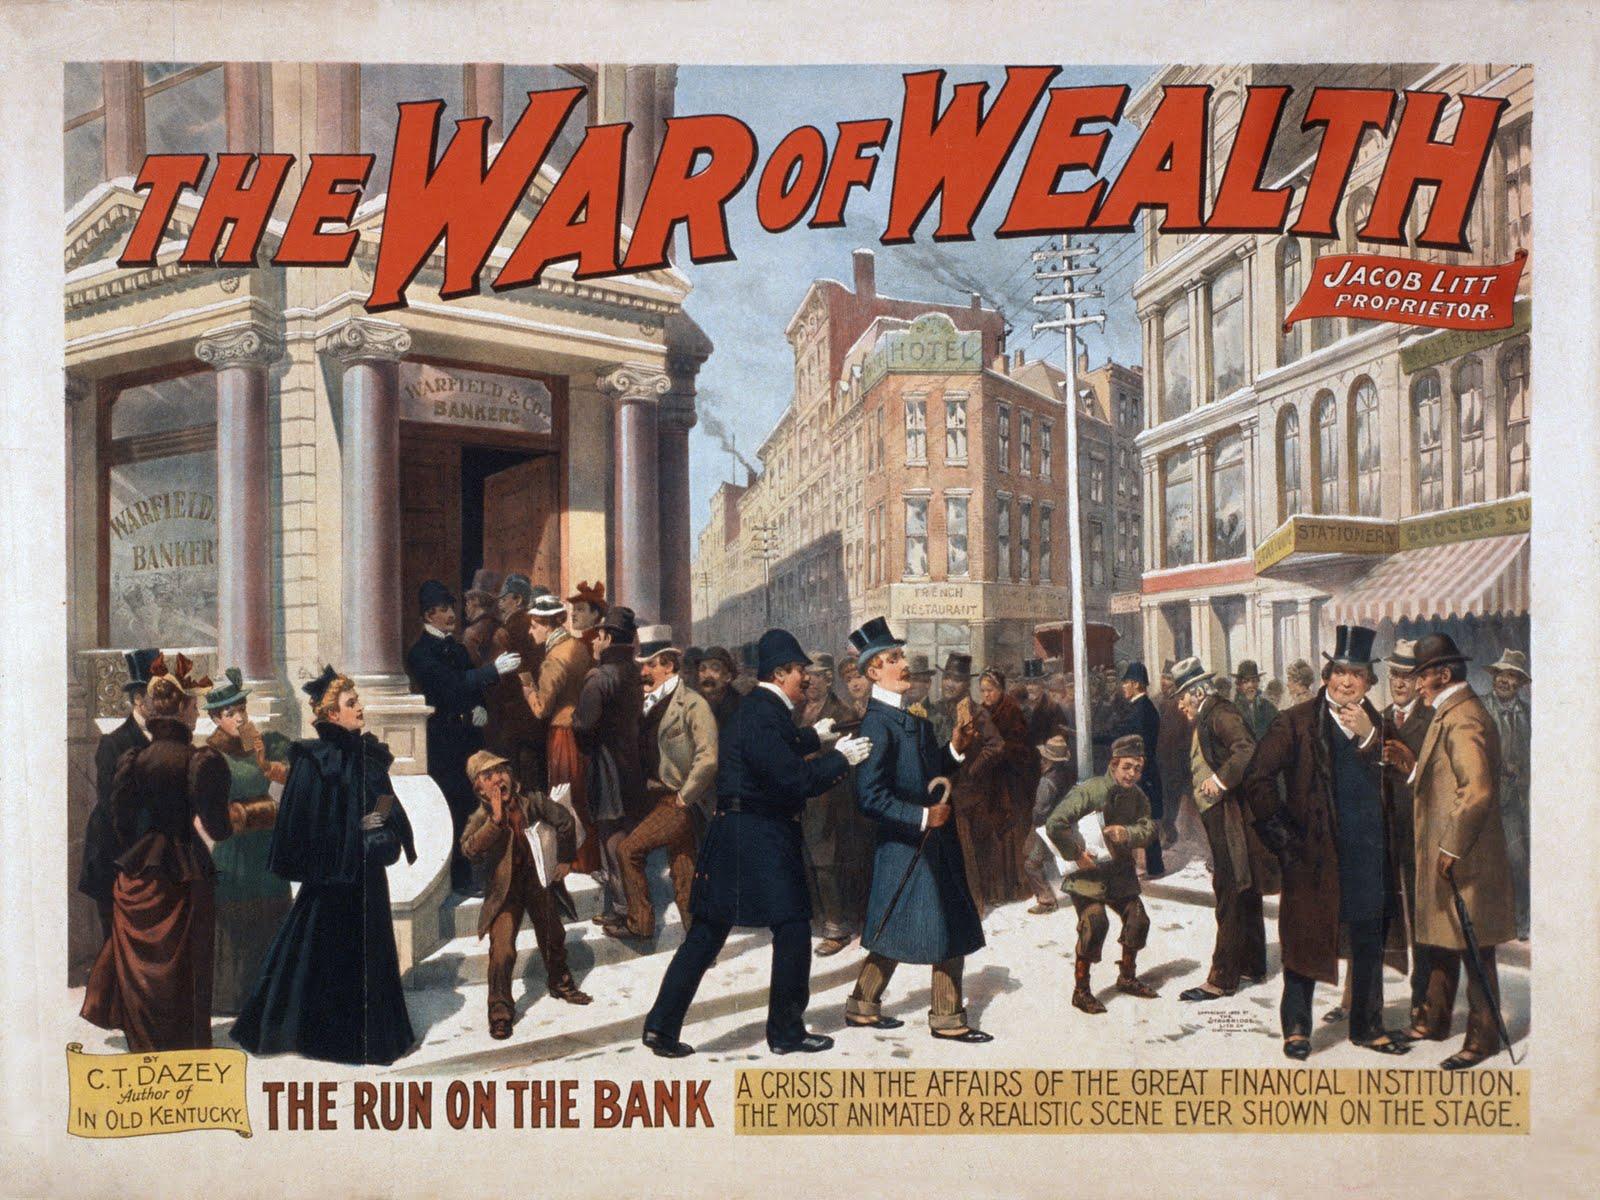 [war+of+wealth_p.jpg]